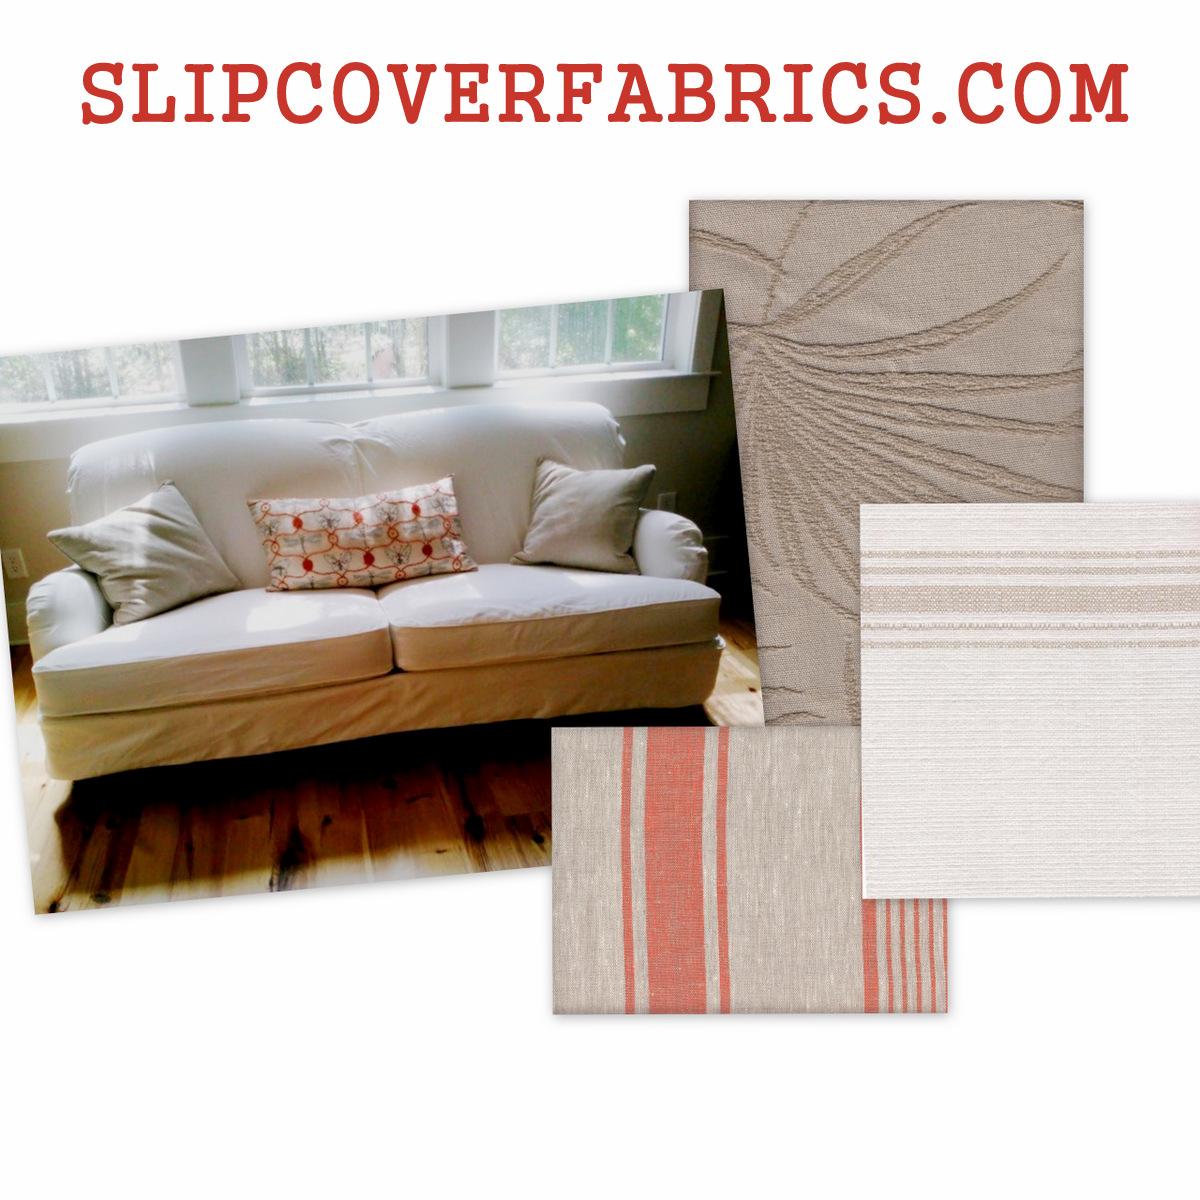 Slipcoverfabrics.com